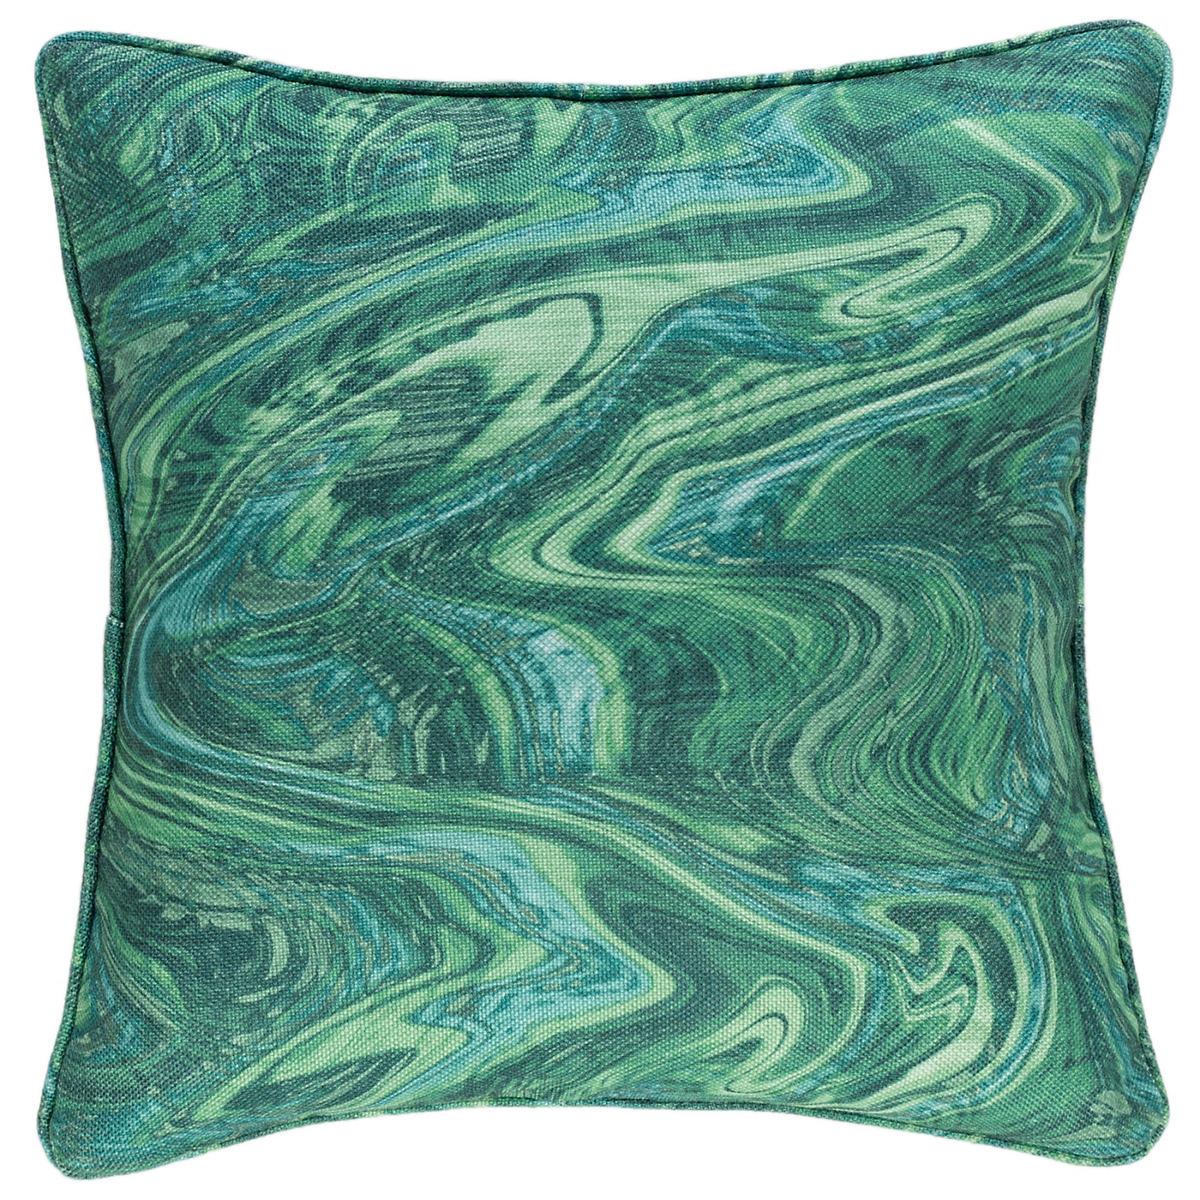 Malachite Indoor/Outdoor Decorative Pillow